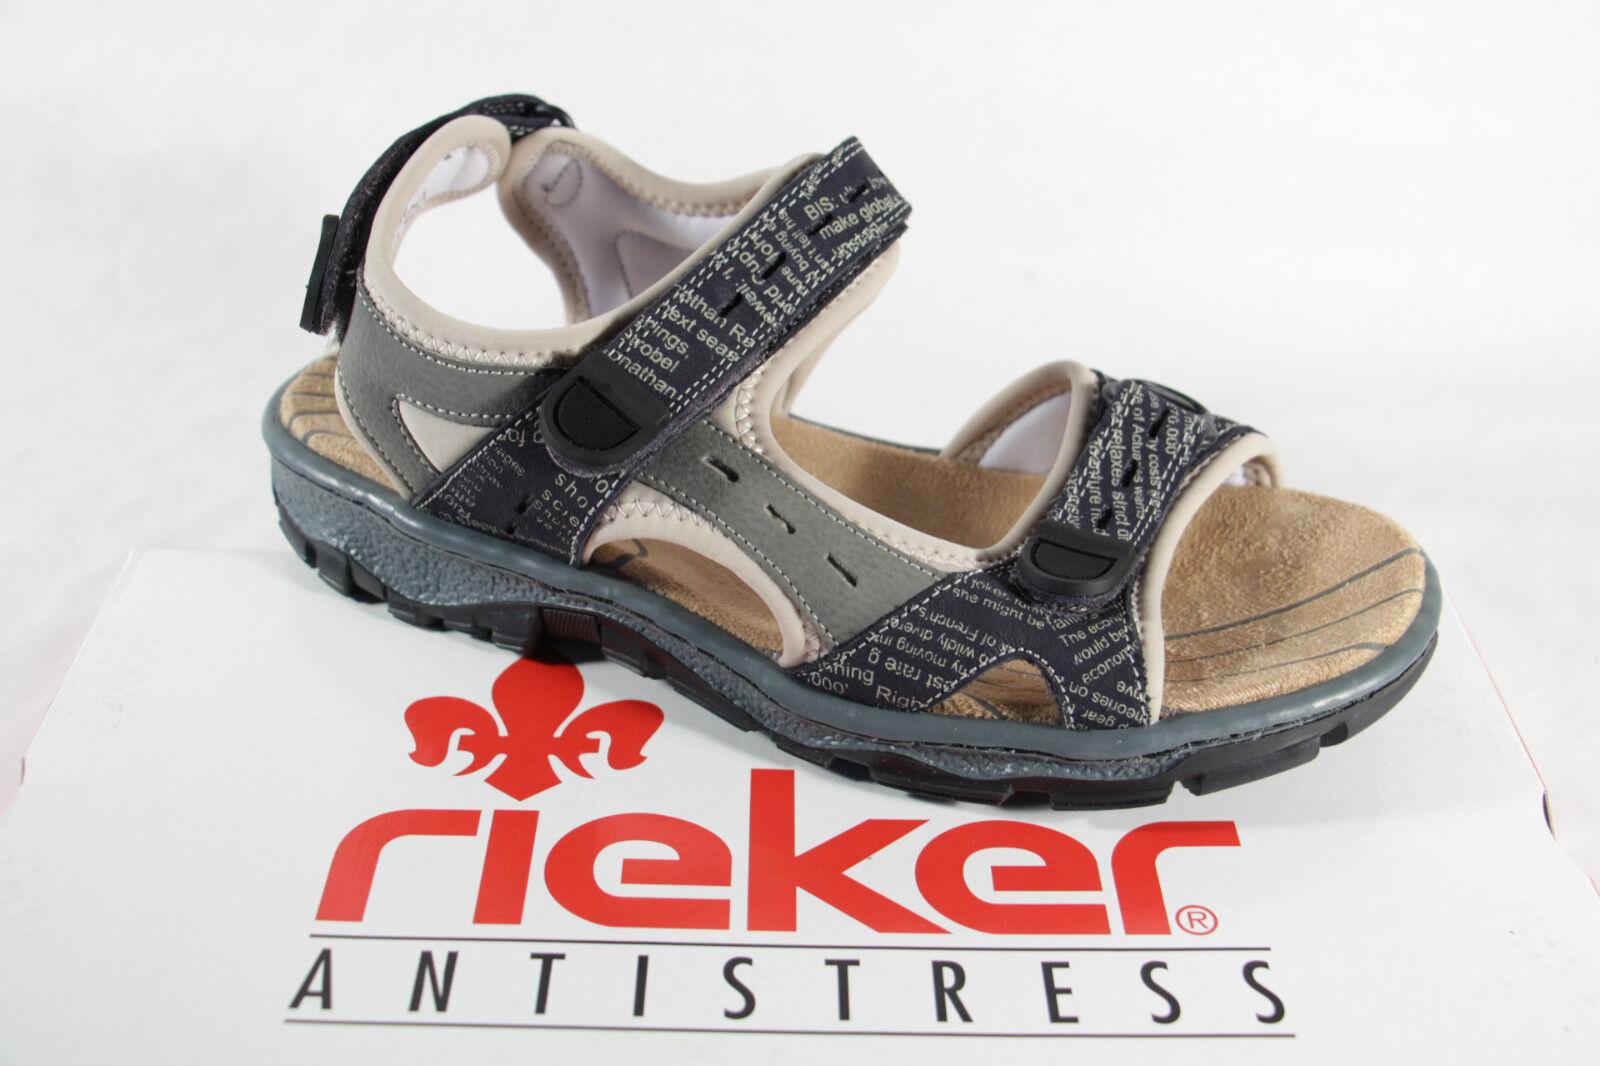 Rieker Sandali In Da Donna Sandalo Sandali Grigio Chiusura In Sandali Velcro 68872 NUOVO!!! 9c6134